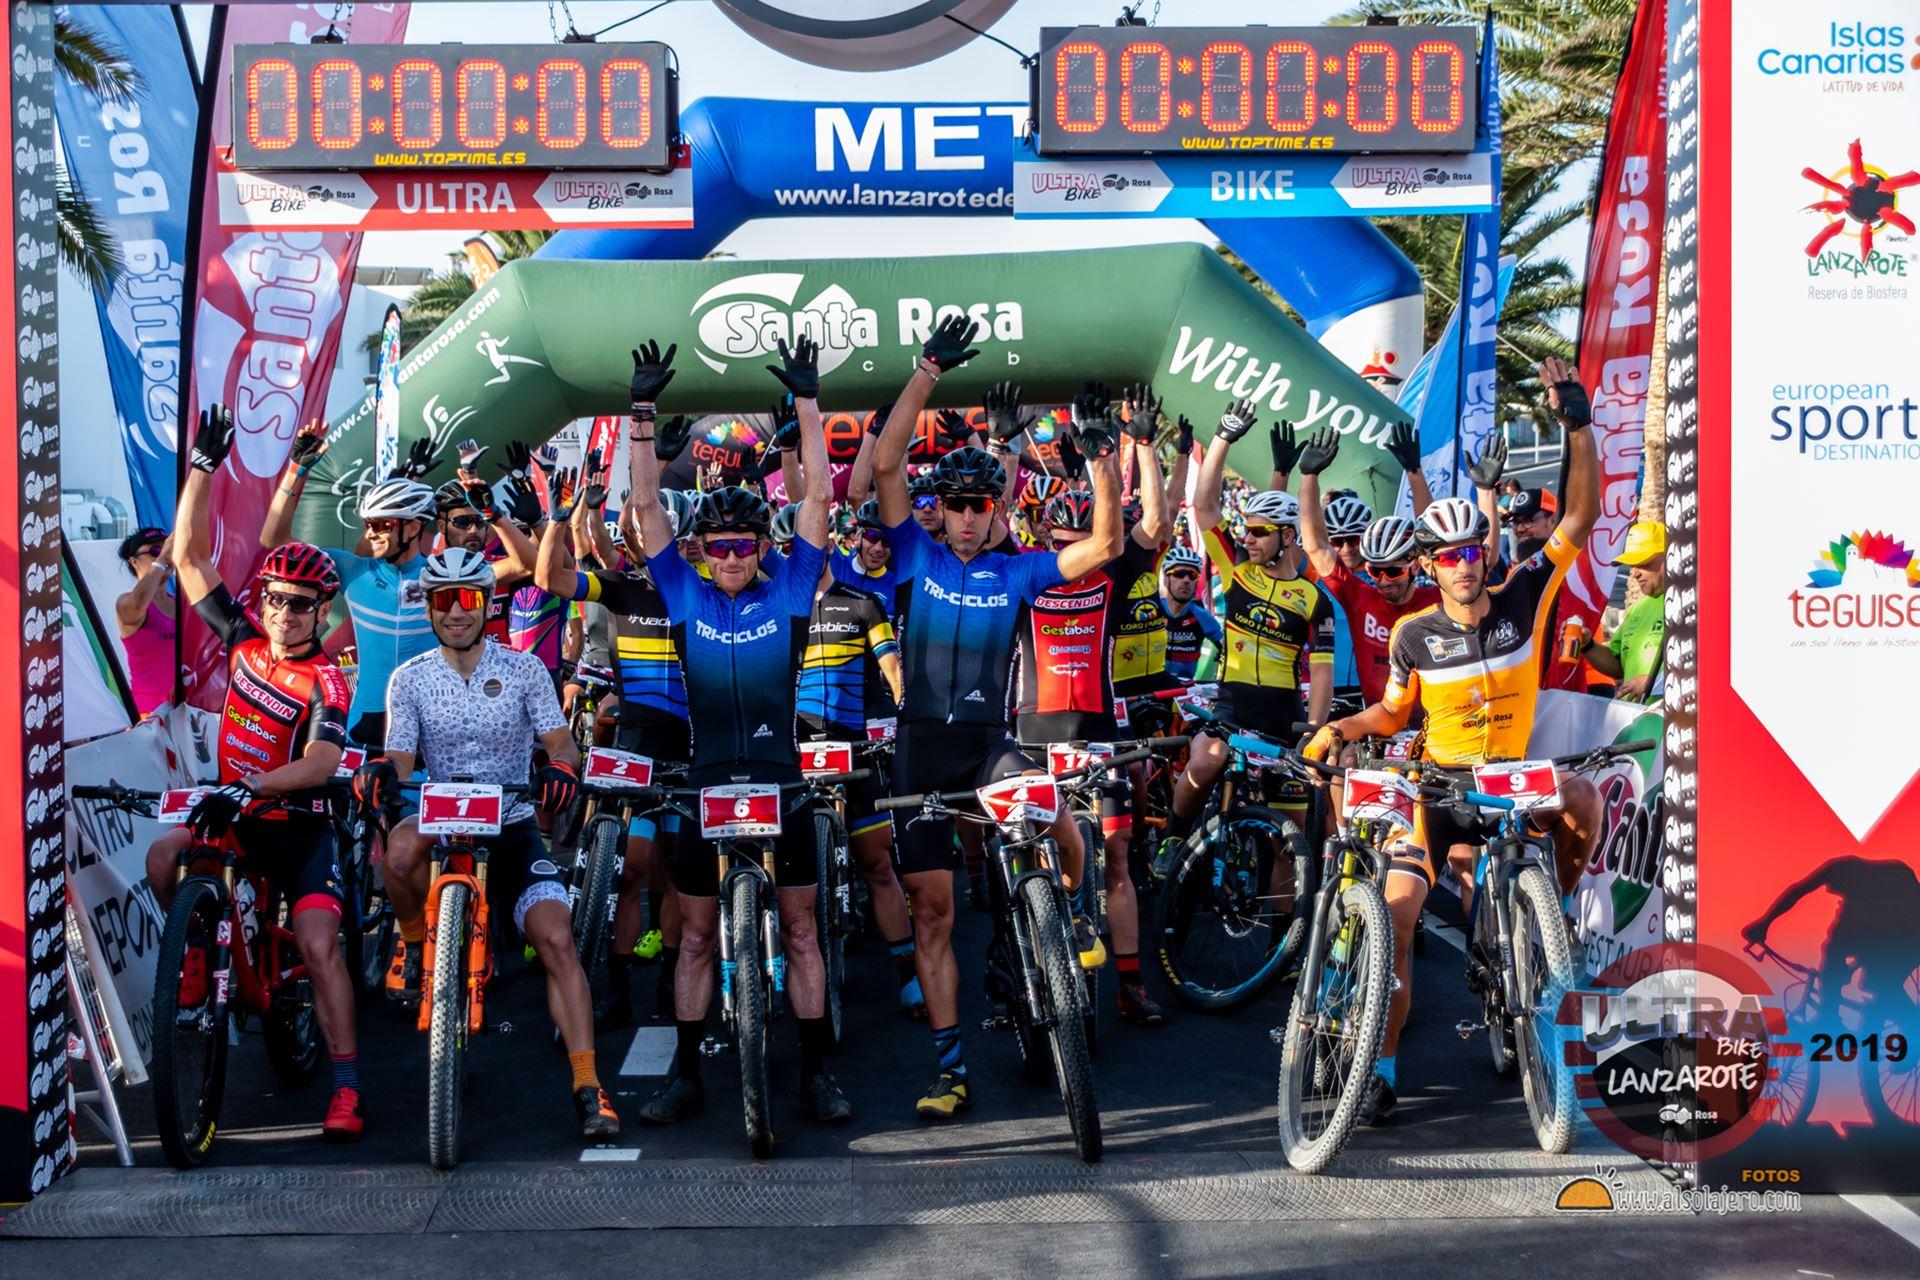 Salida 2ª Etapa Ultrabike 2019 Fotos Alsolajero.com-19